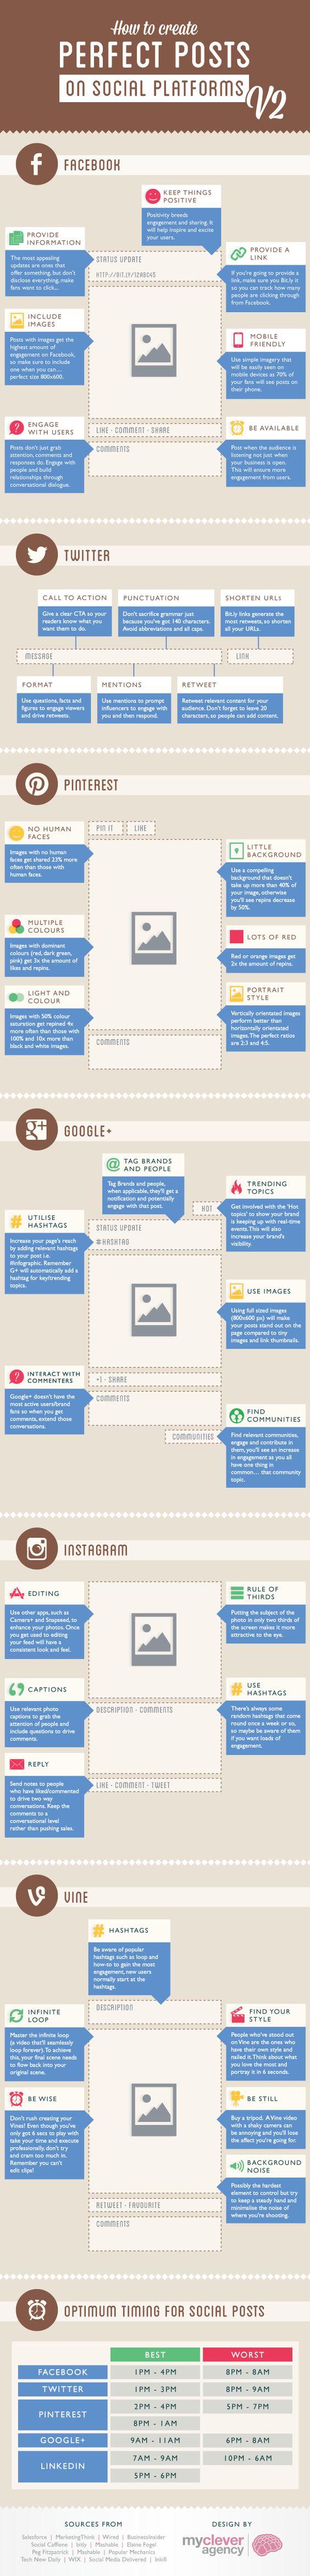 Infografik: so gelingt der perfekte Post. (screenshot: mycleveragency)